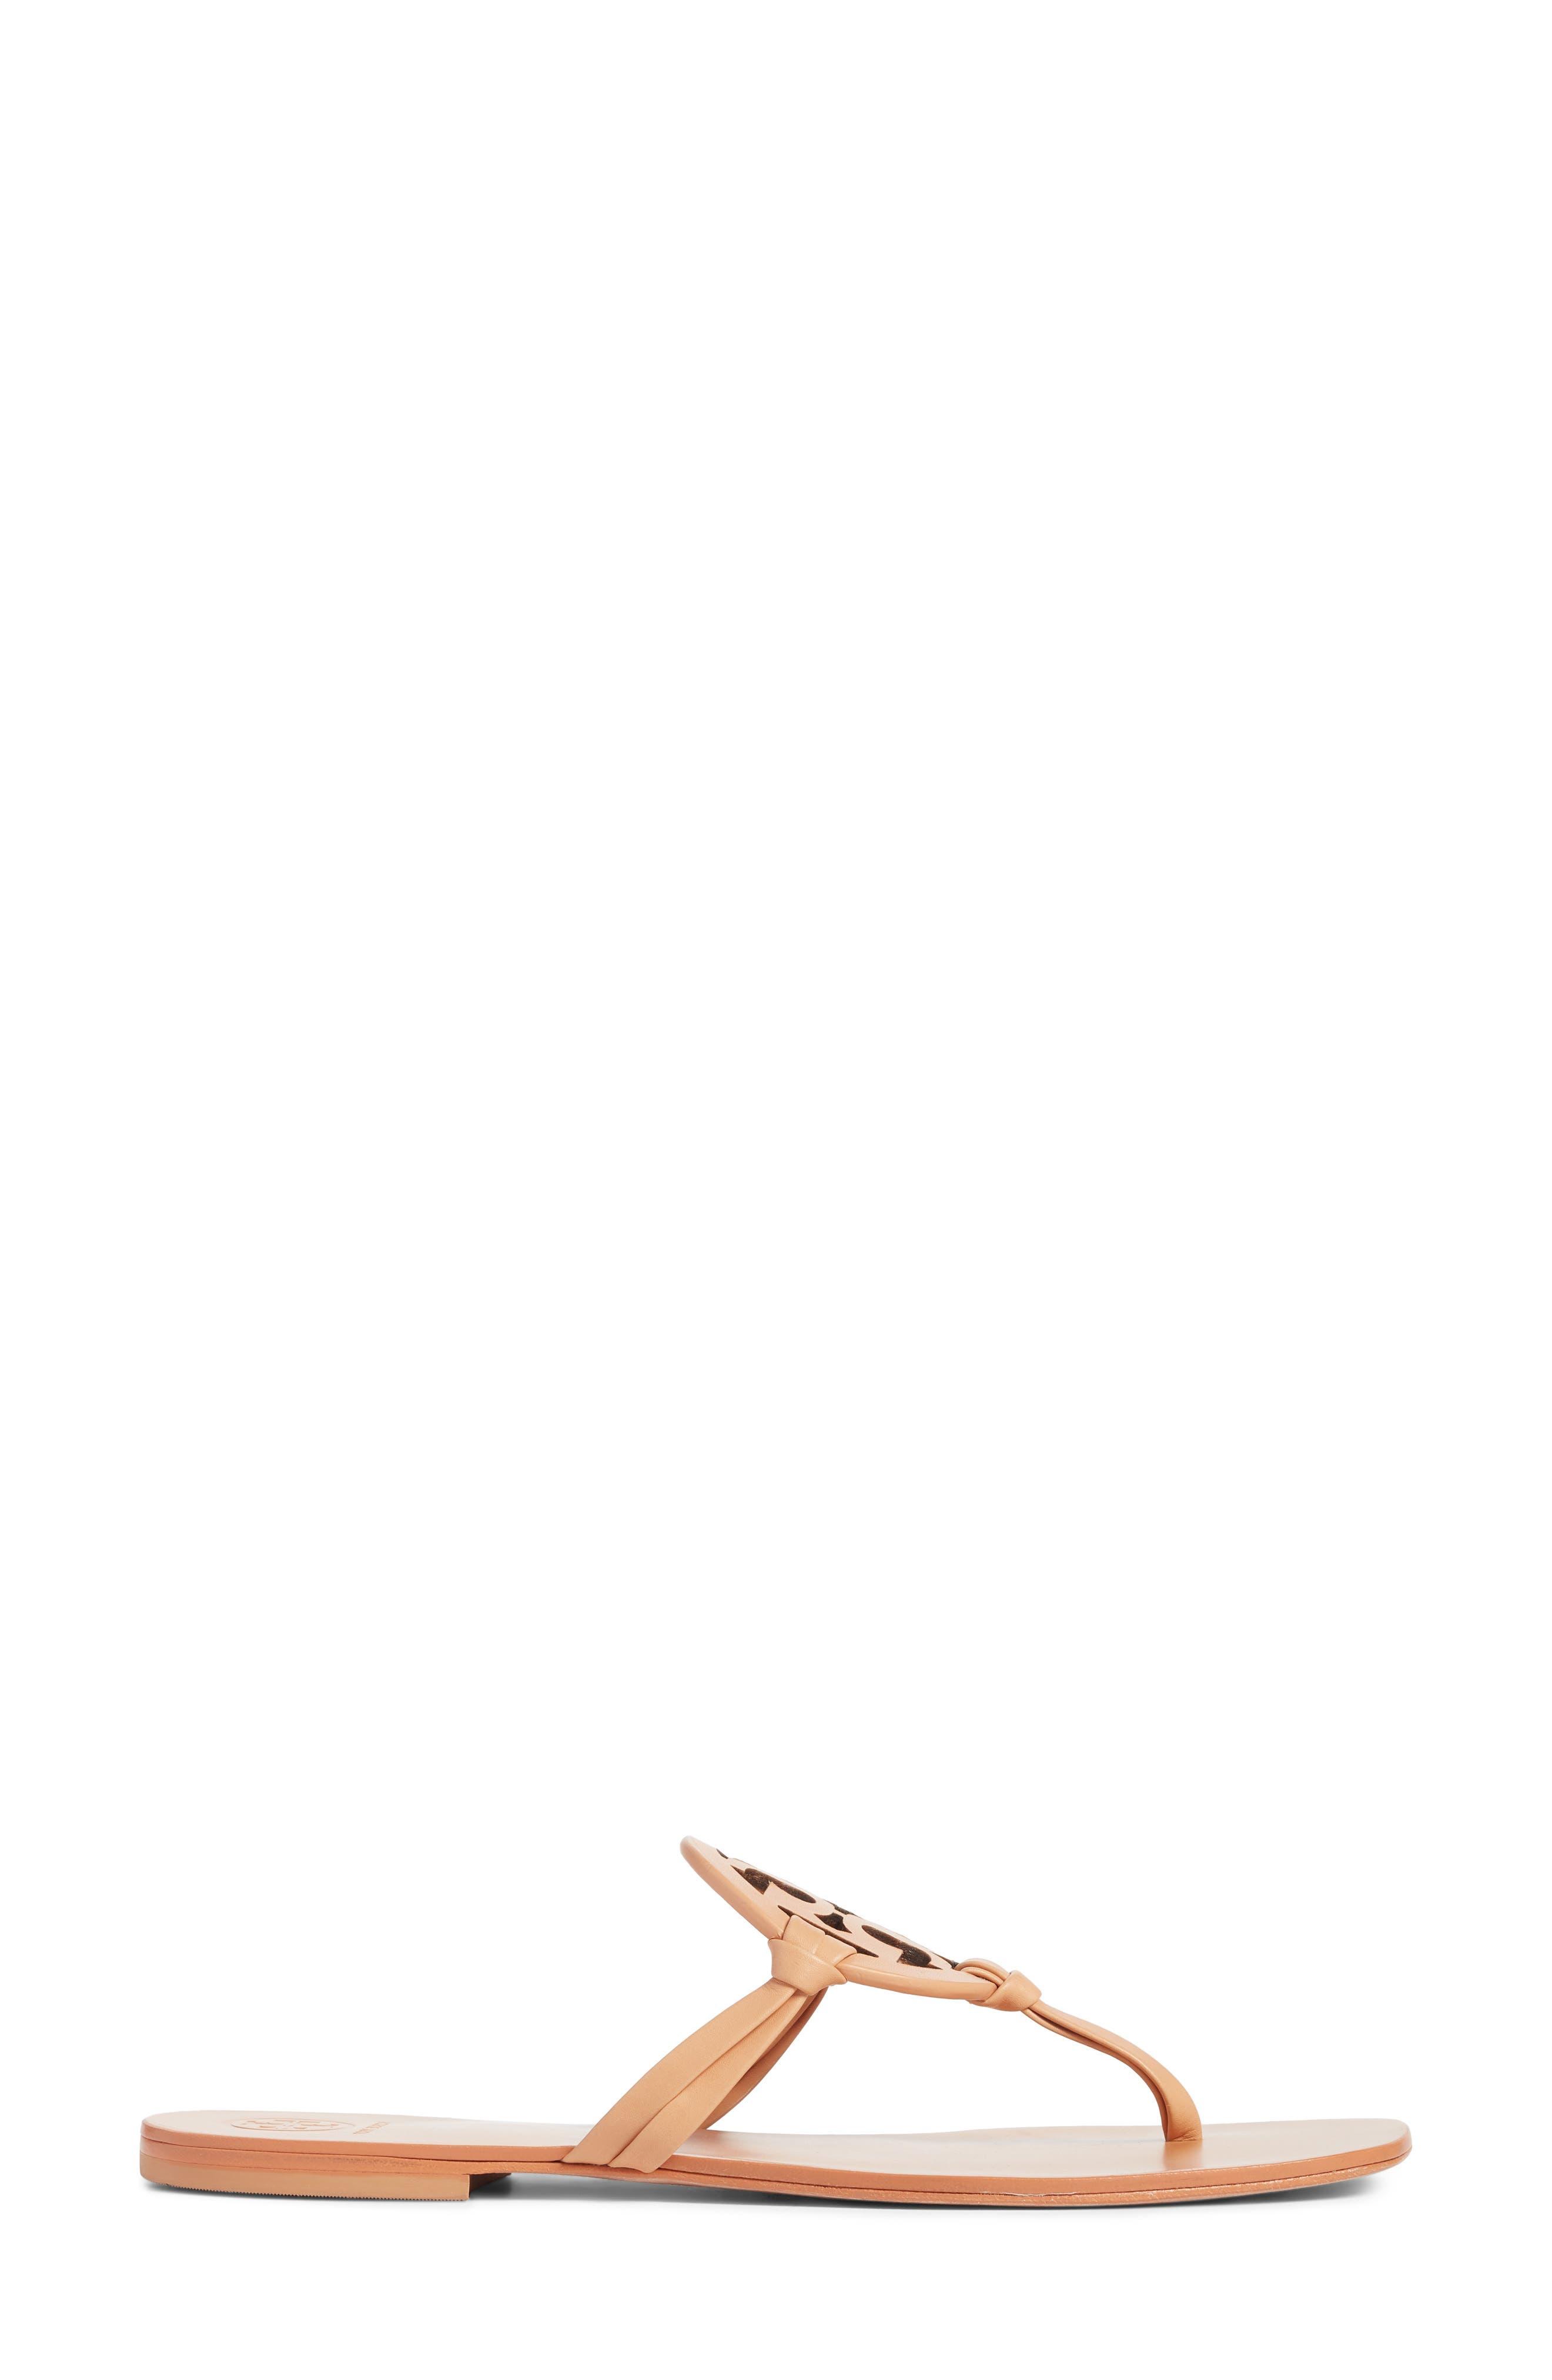 Miller Logo Thong Sandal,                             Alternate thumbnail 3, color,                             NATURAL VACHETTEA